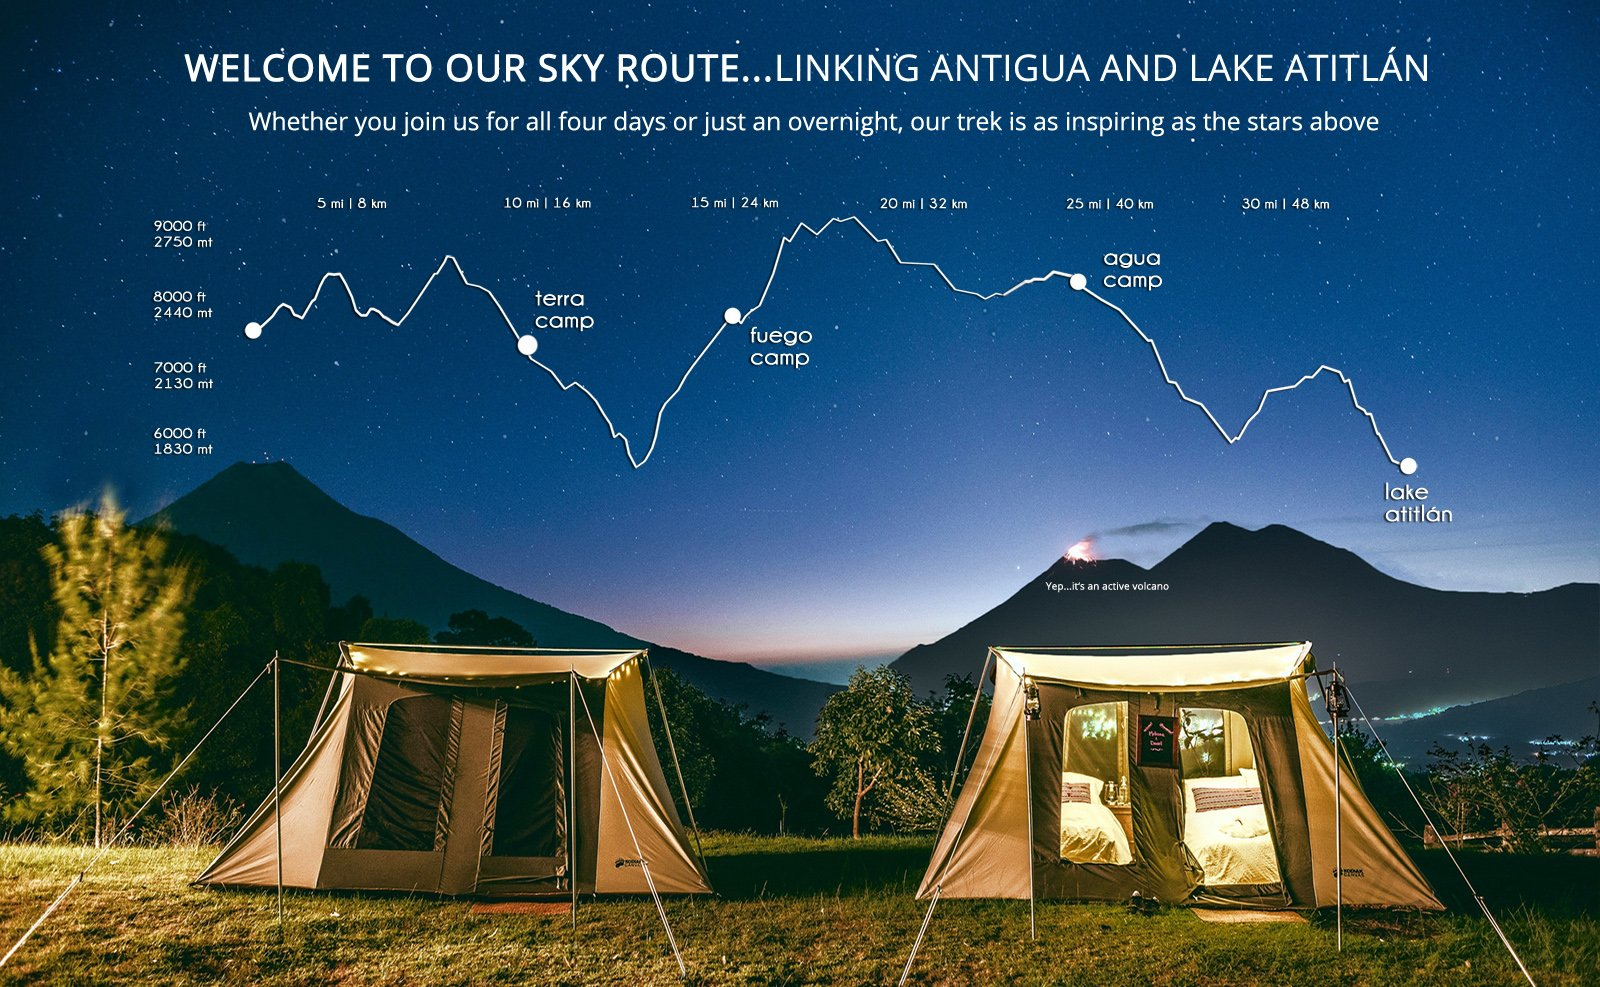 Trek Guatemala trekking route from Antigua to Lake Atitlán